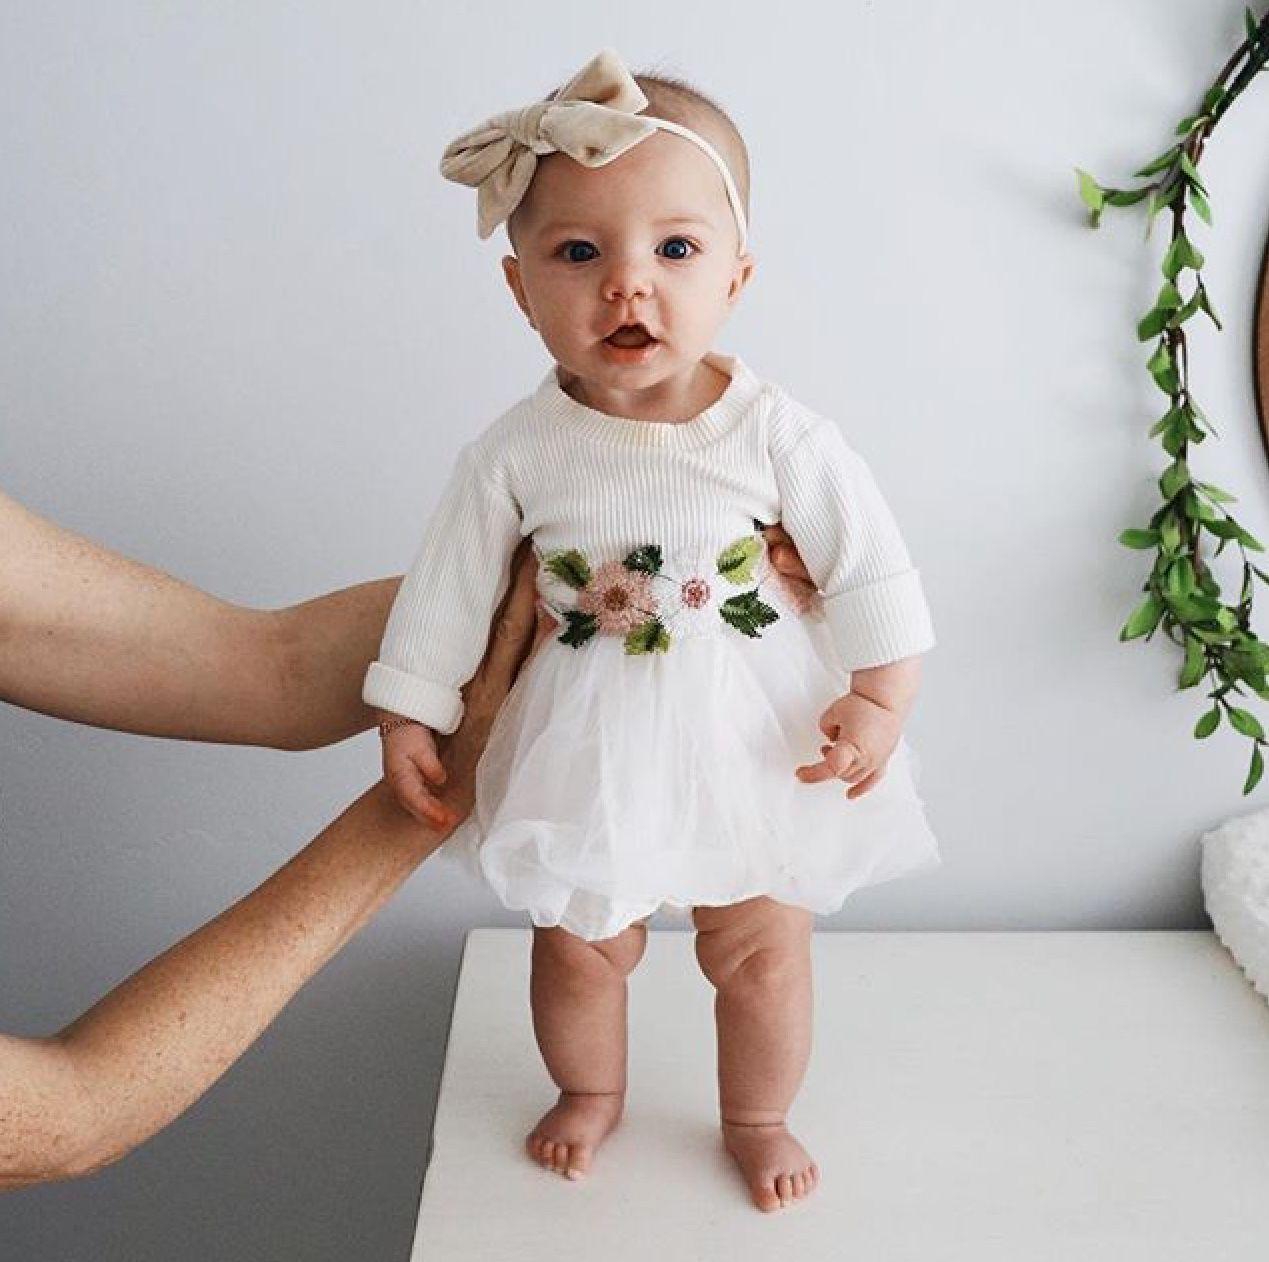 F O L W Https Www Pinterest Com Abbytporter Baby Girl Clothes Kids Outfits